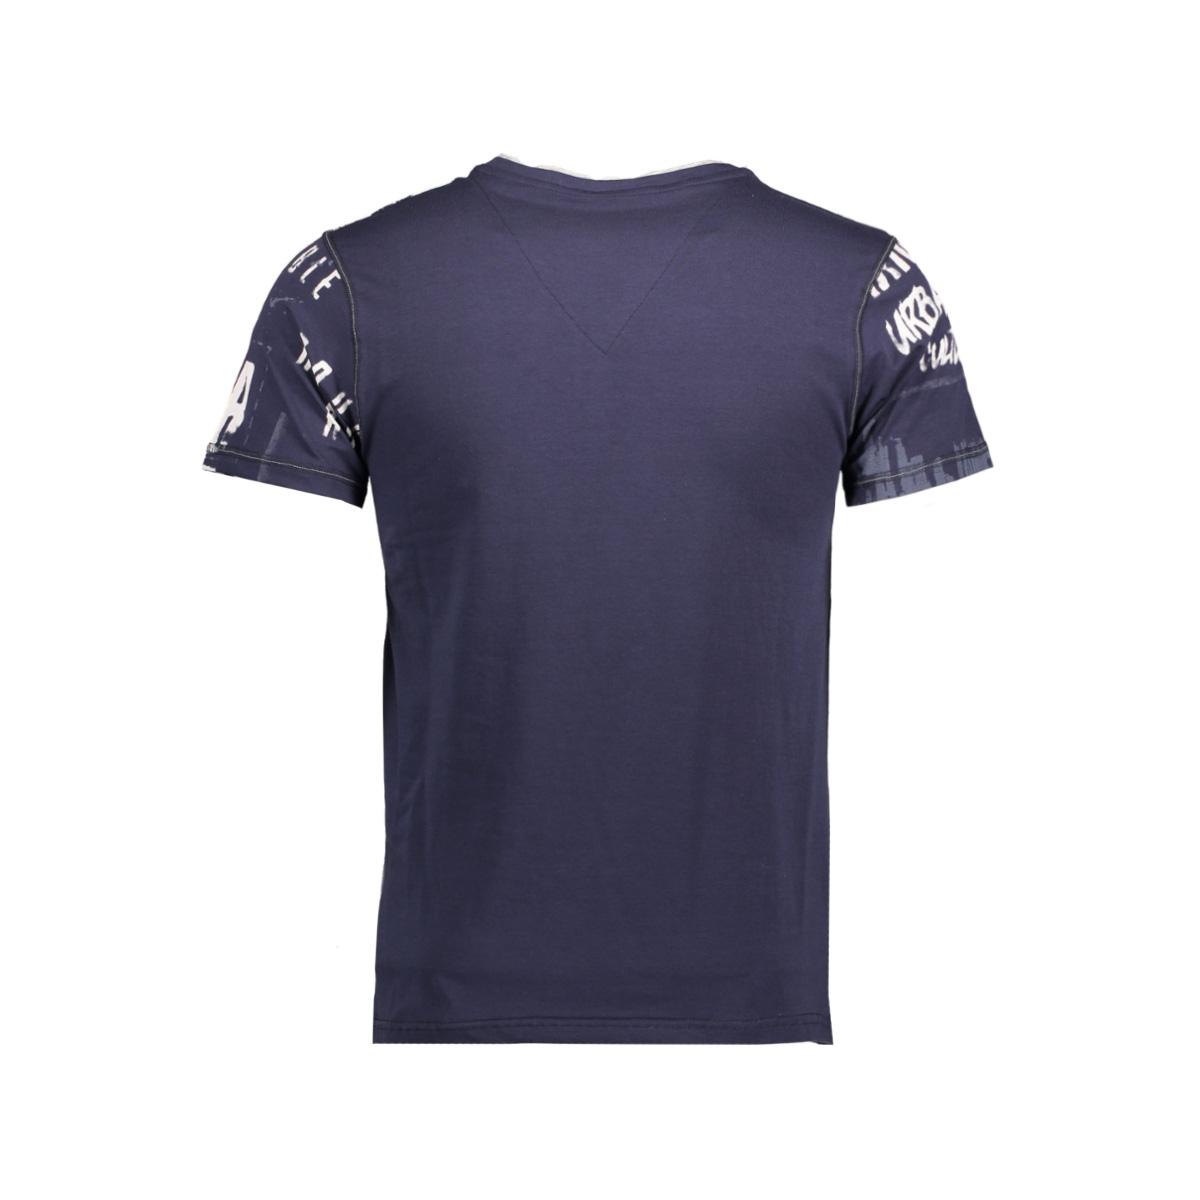 13868 gabbiano t-shirt navy